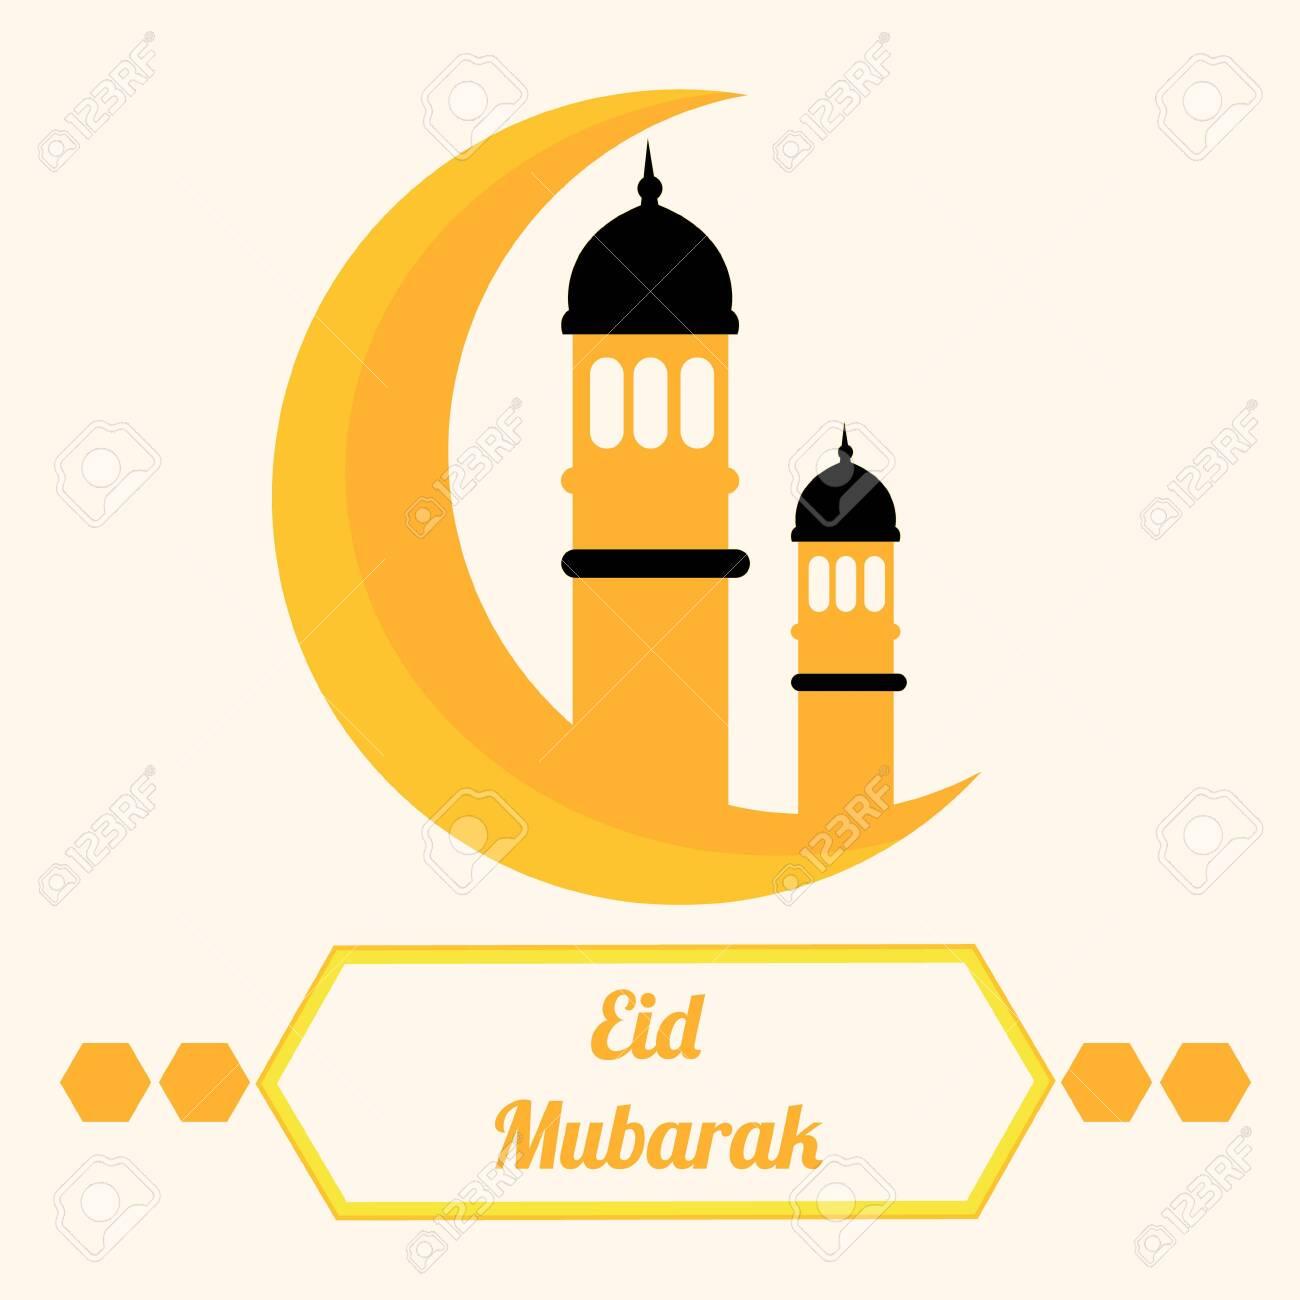 Eid Mubarak Logo Design Template Eid Mubarak Symbol Icon Royalty Free Cliparts Vectors And Stock Illustration Image 142061828